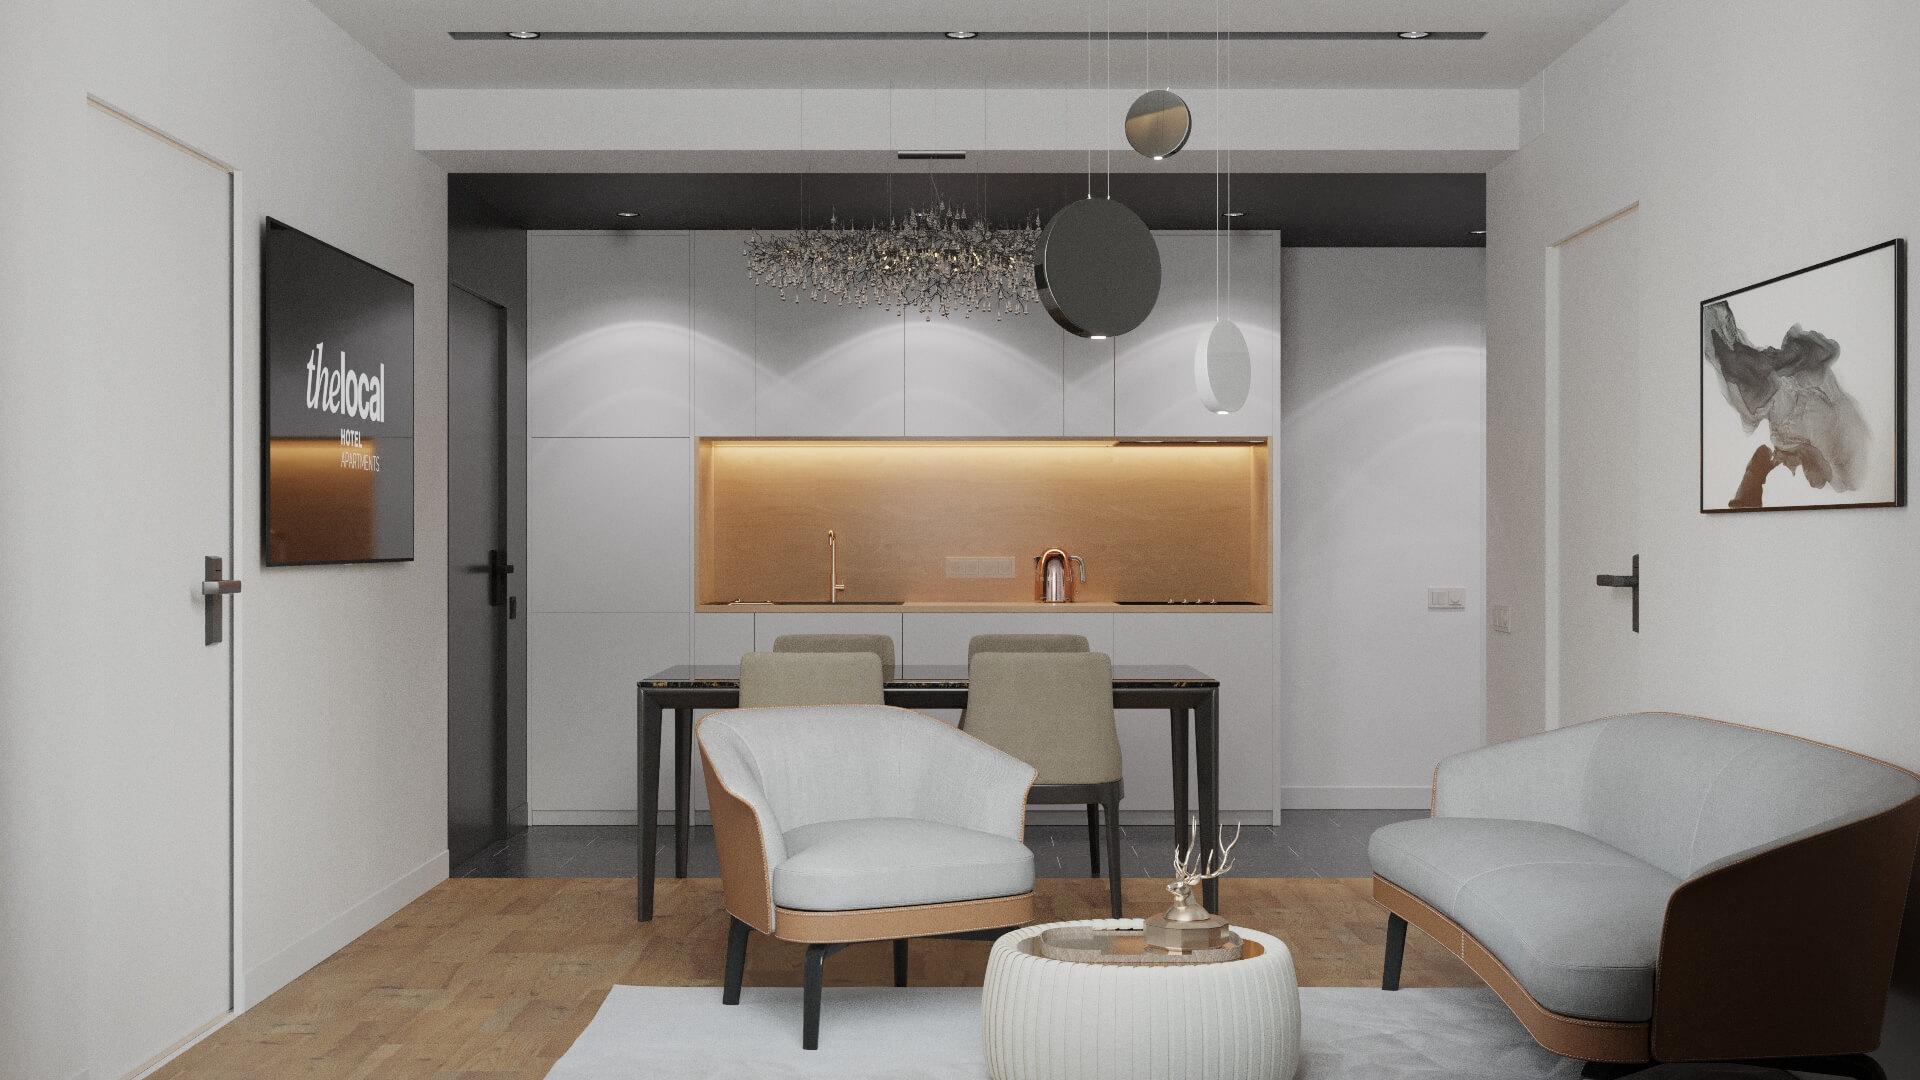 GRAND HOTEL MINSK | INTERIOR